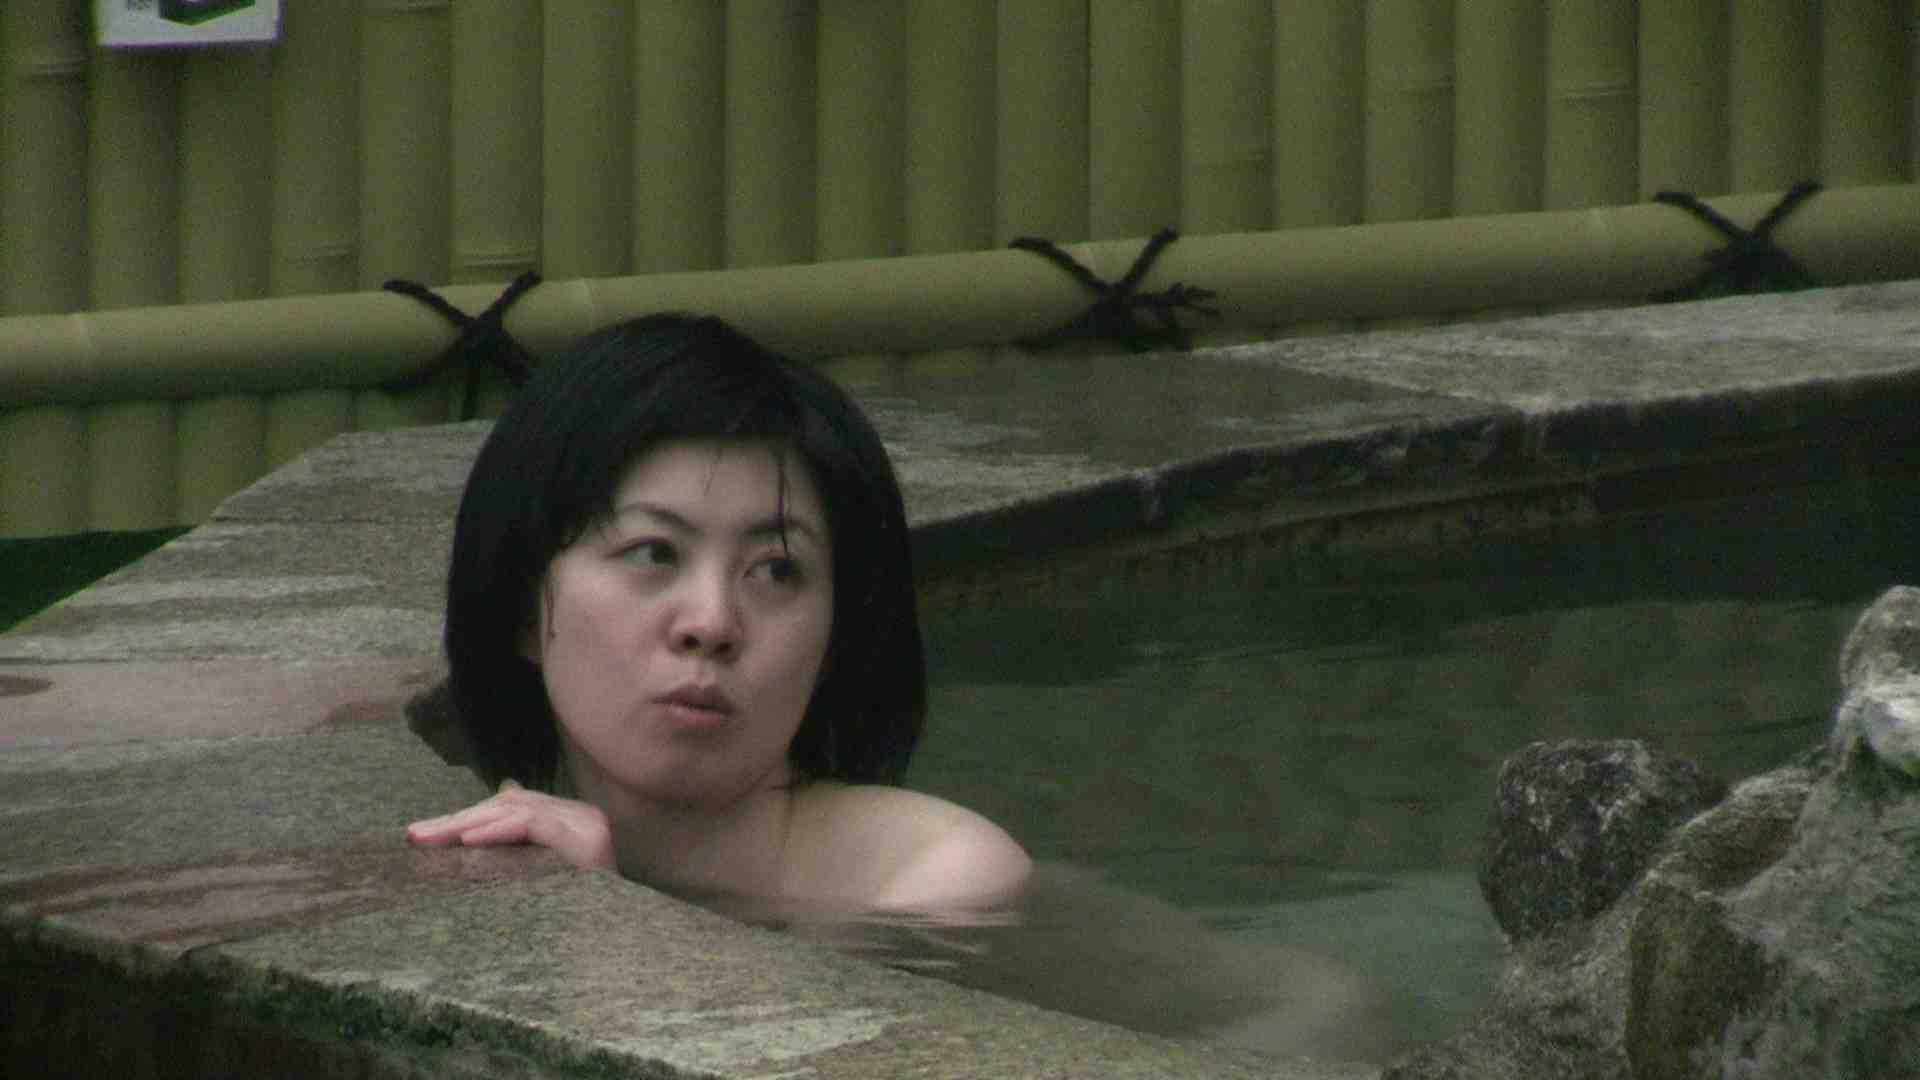 Aquaな露天風呂Vol.685 盗撮シリーズ | 露天風呂編  95PIX 51